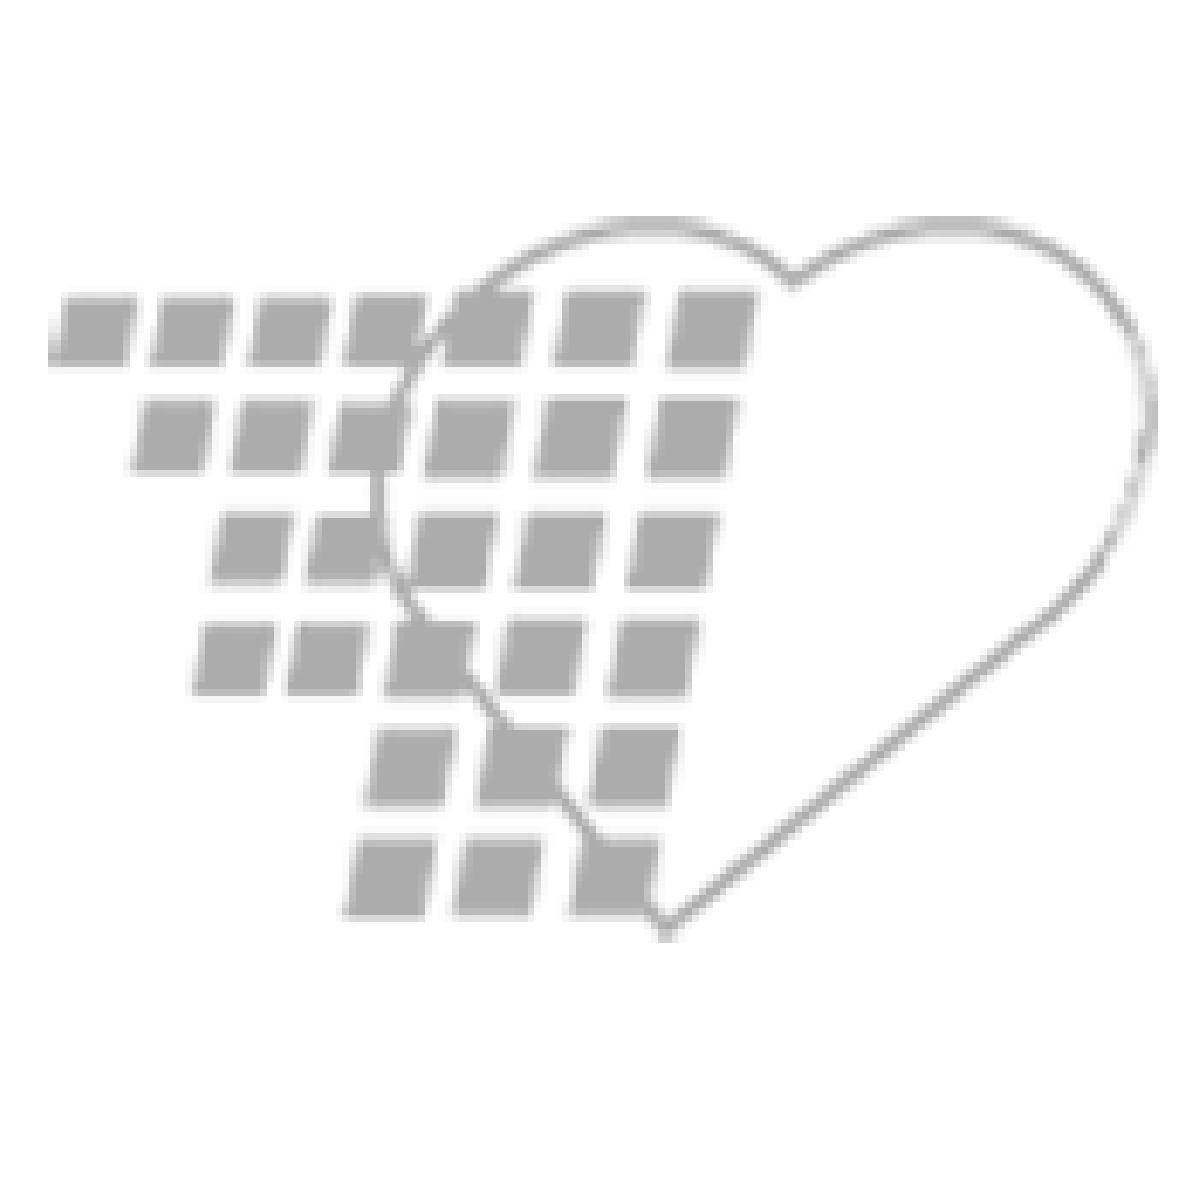 06-93-6103 - Demo Dose® Simulated FFP A Rh Negative